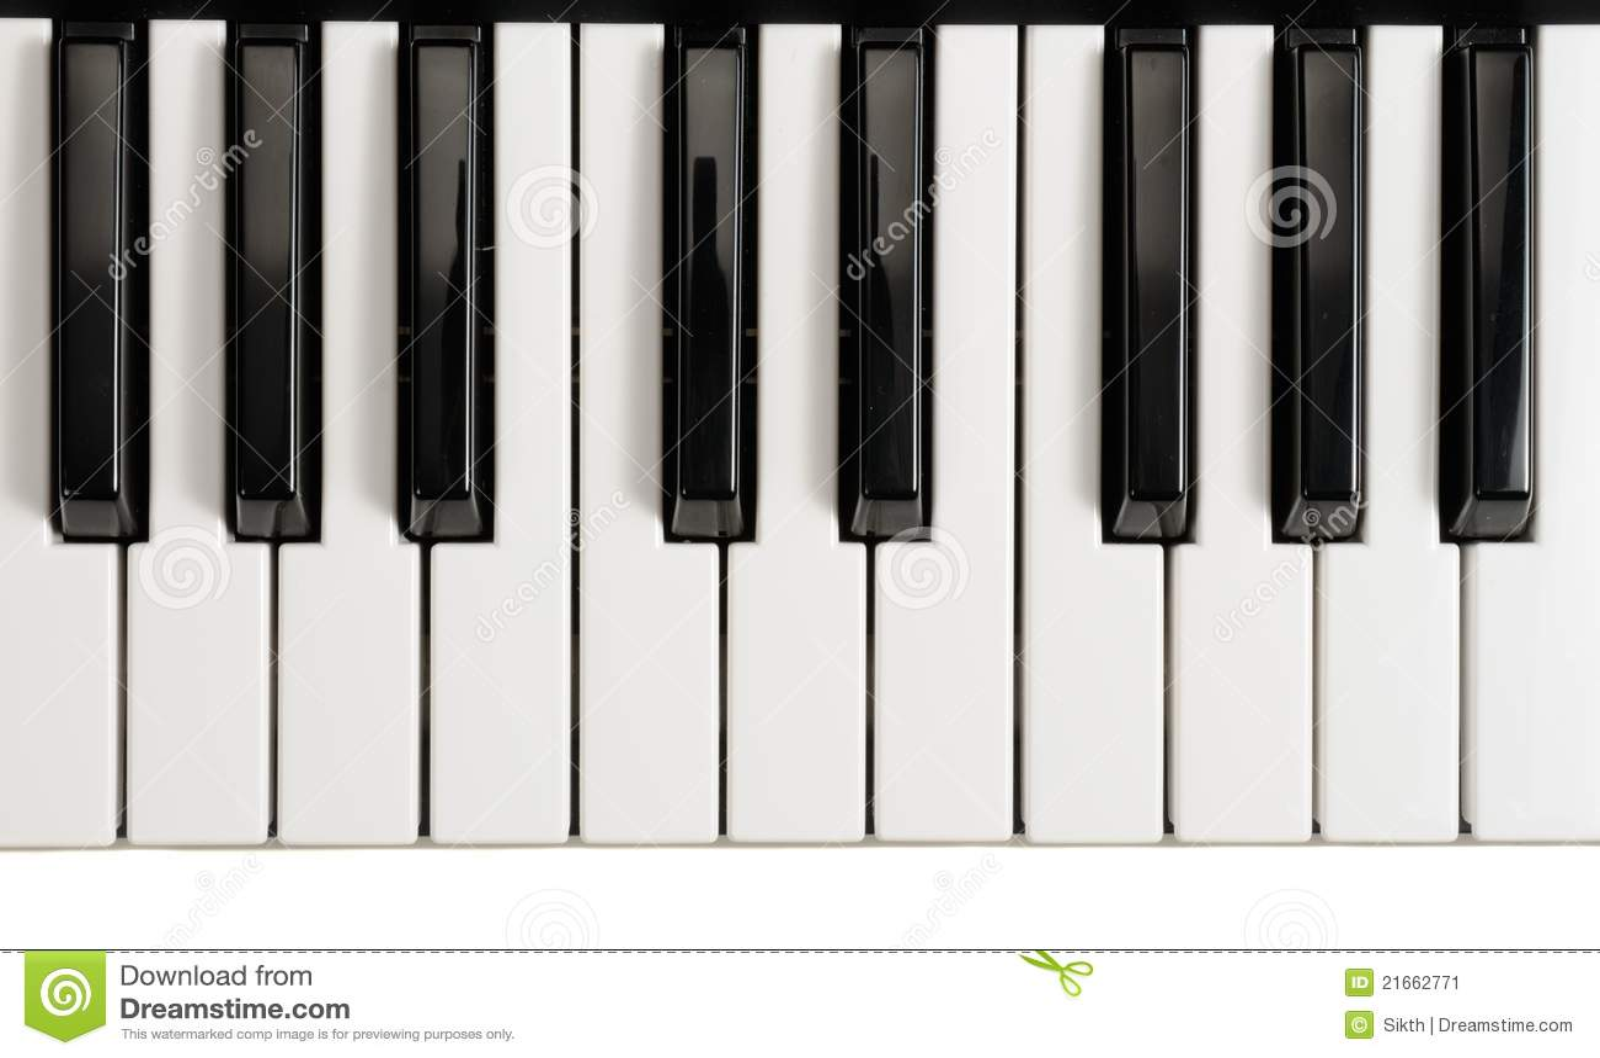 piano keys stock image image 21662771 newborn clipart black and white newborn clipart free